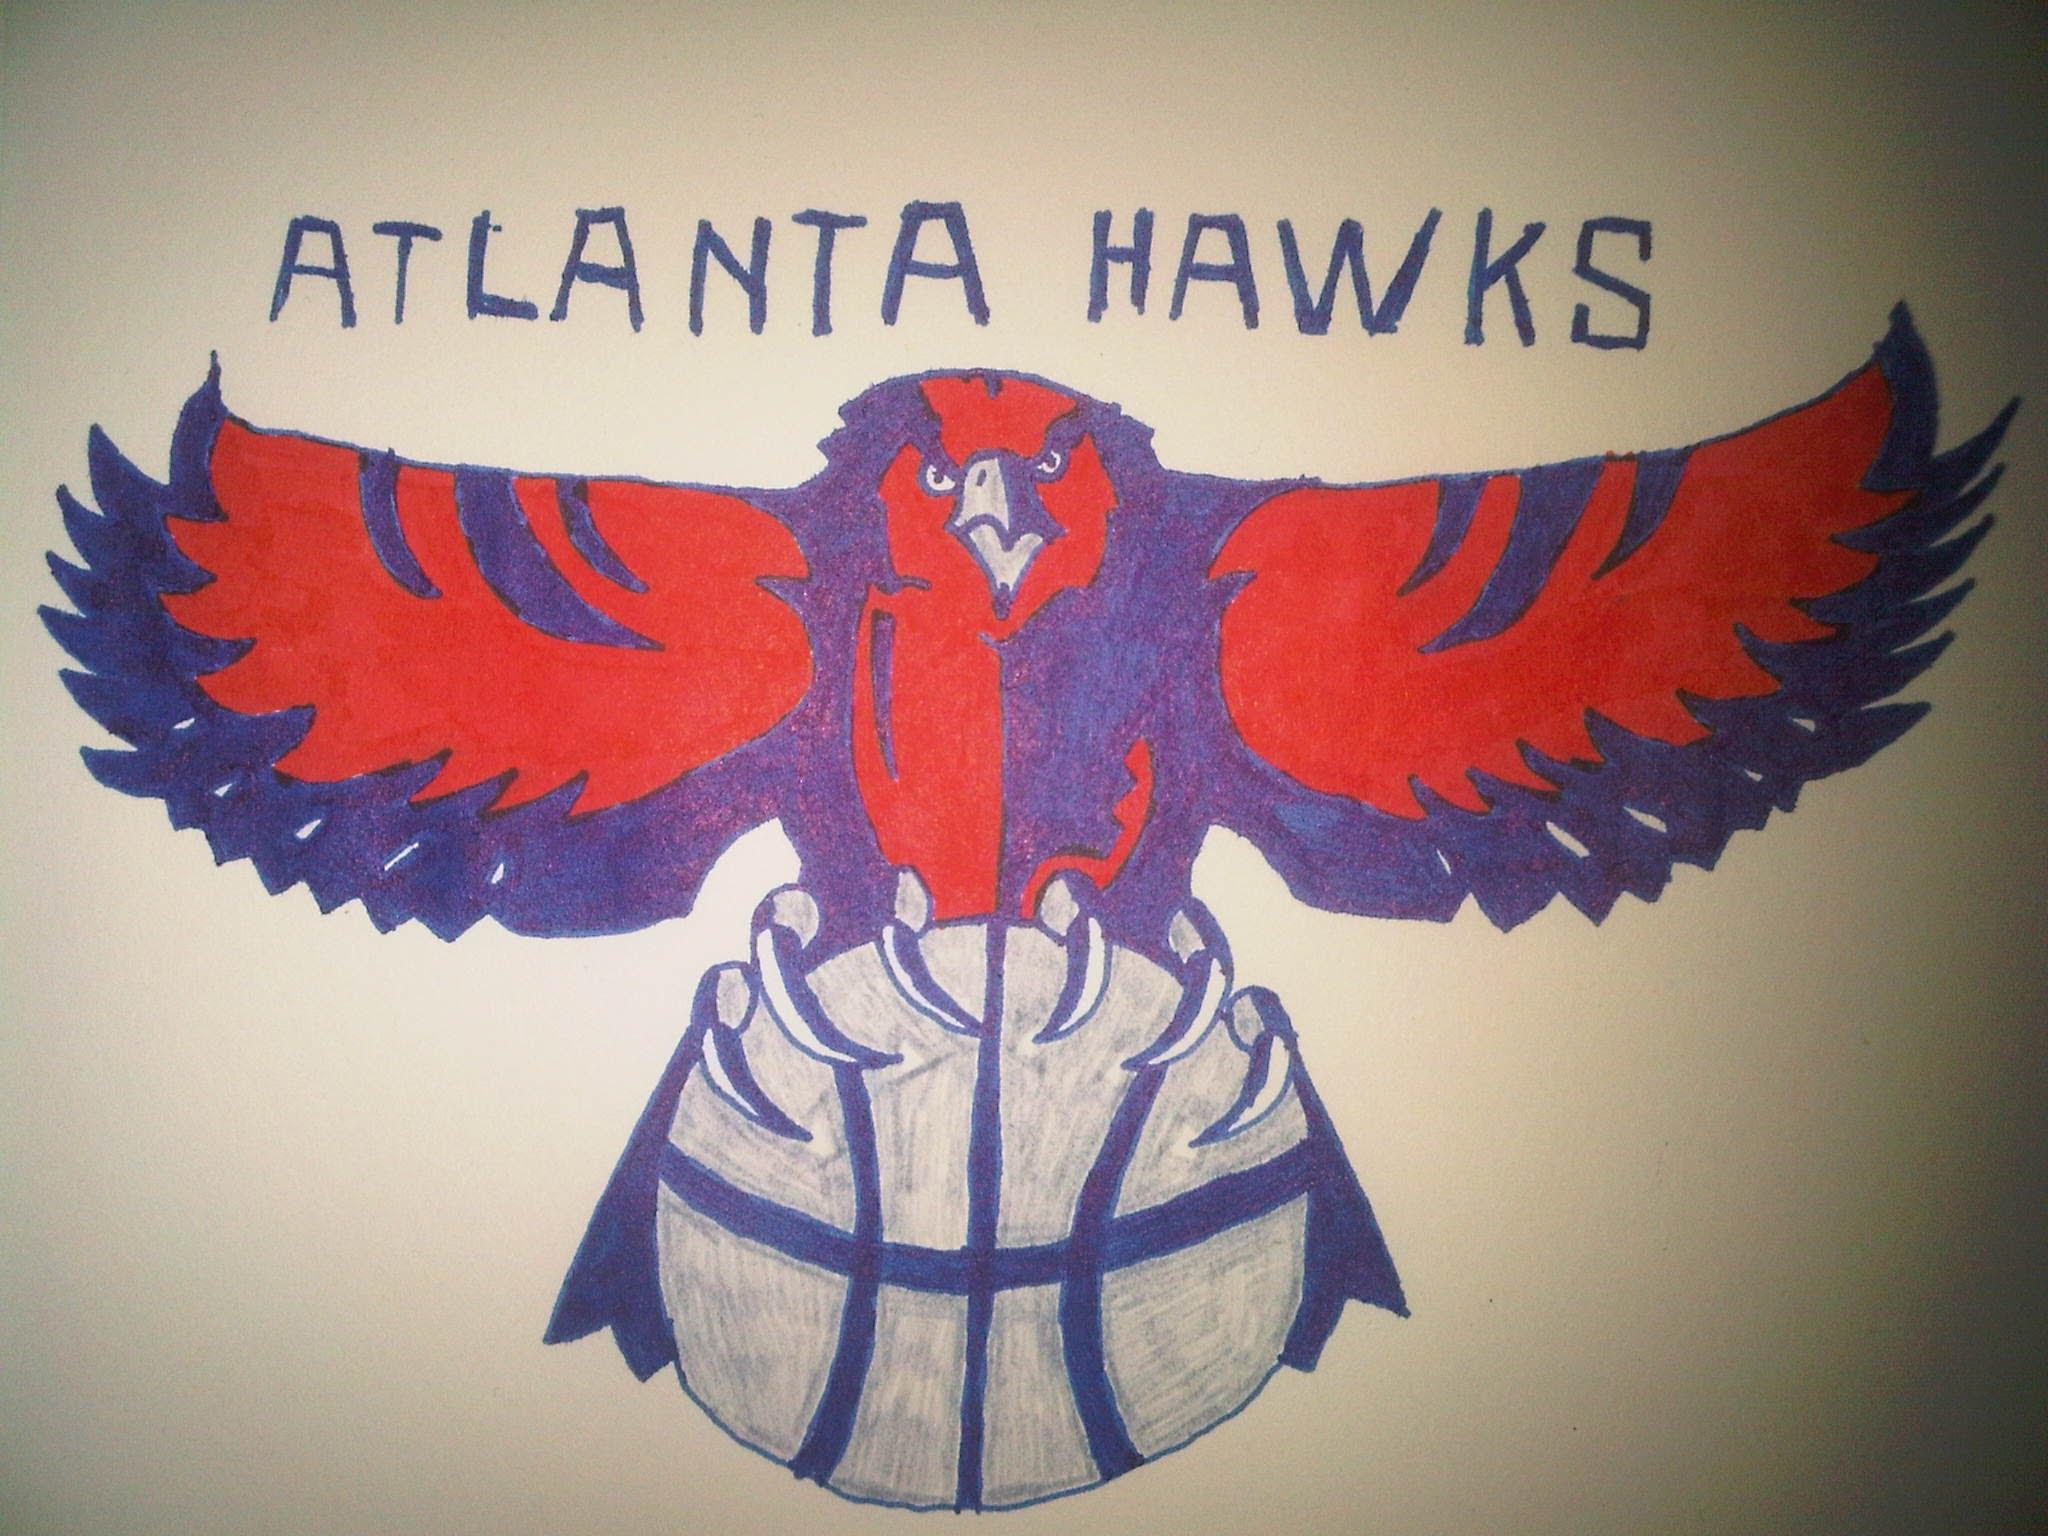 2048x1536 How To Draw The Atlanta Hawks Logo